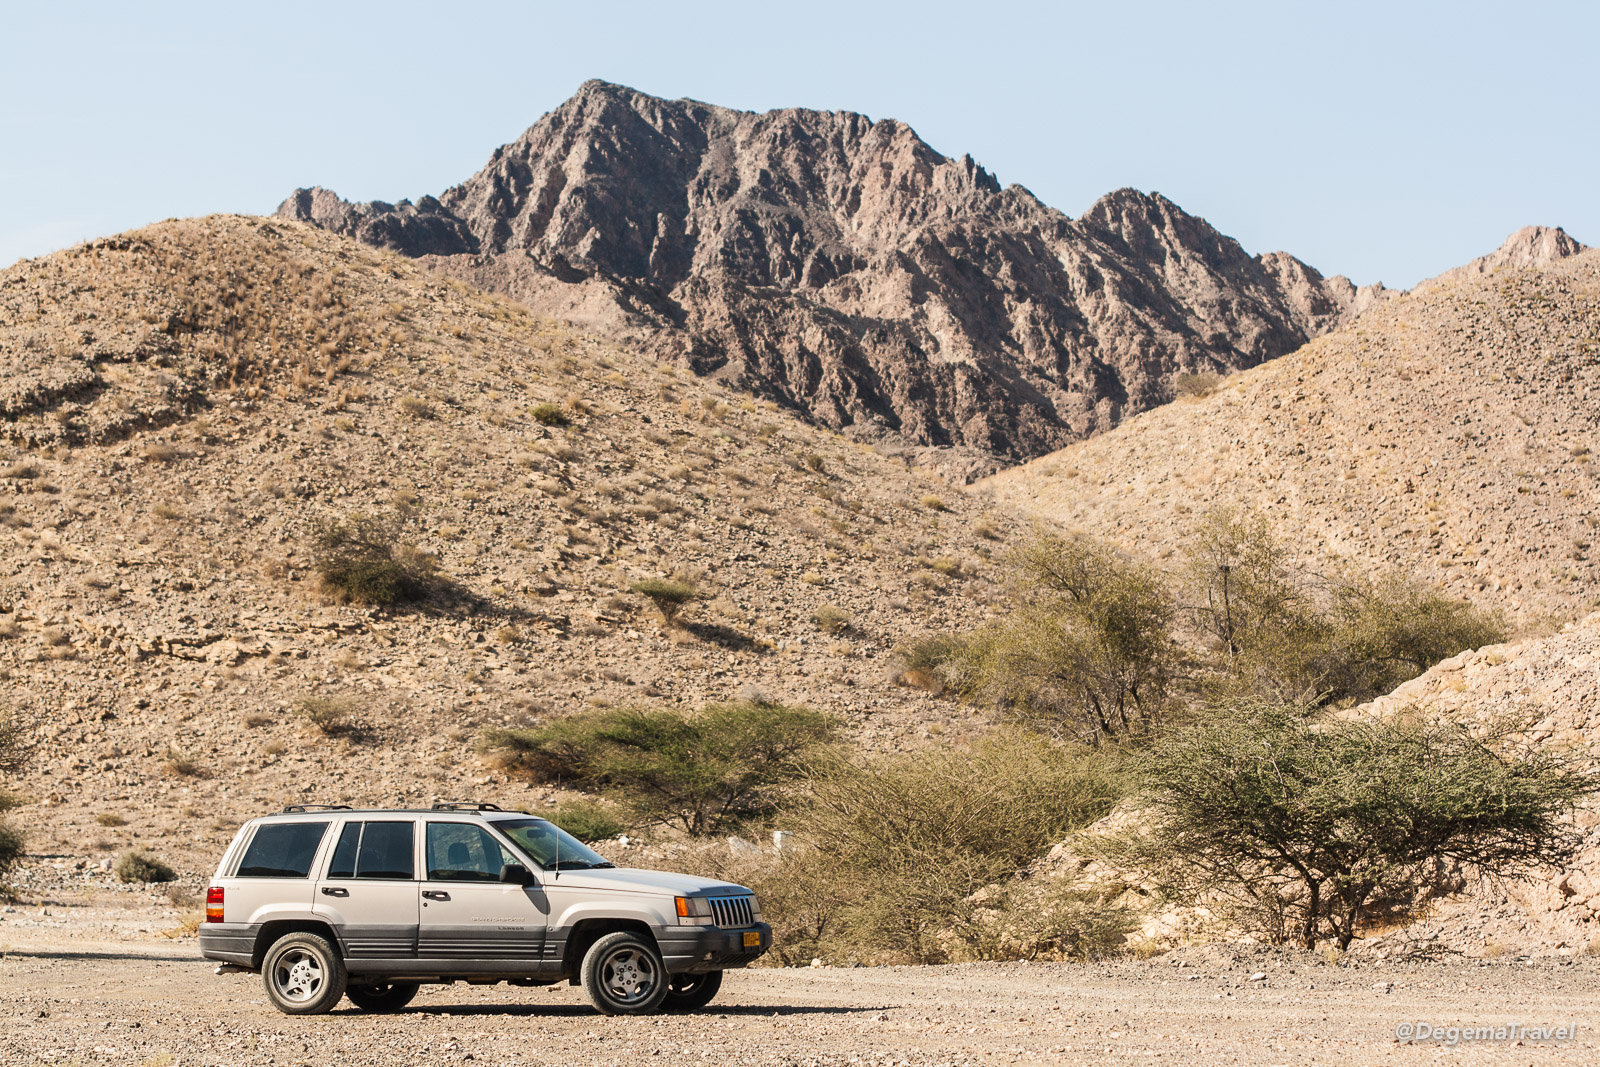 1997 Jeep Grand Cherokee Laredo in Muscat, Oman